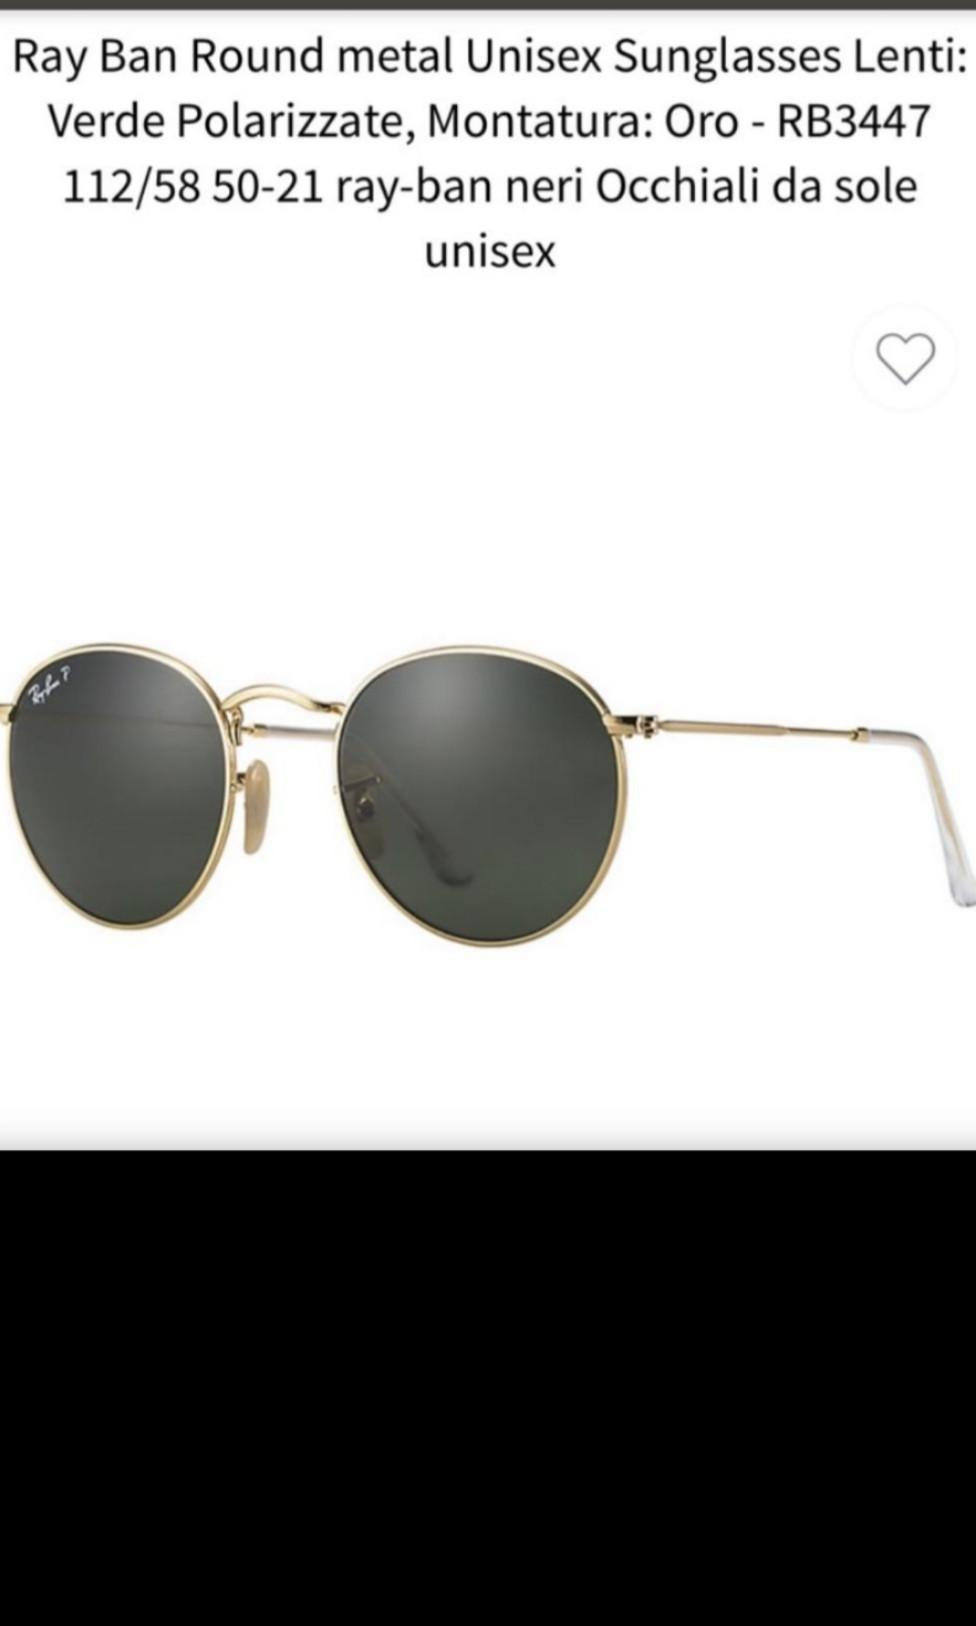 3840acf15 Original/Genuine Ray Ban Round Metal Sunglasses (oro rb3447 112/58 ...